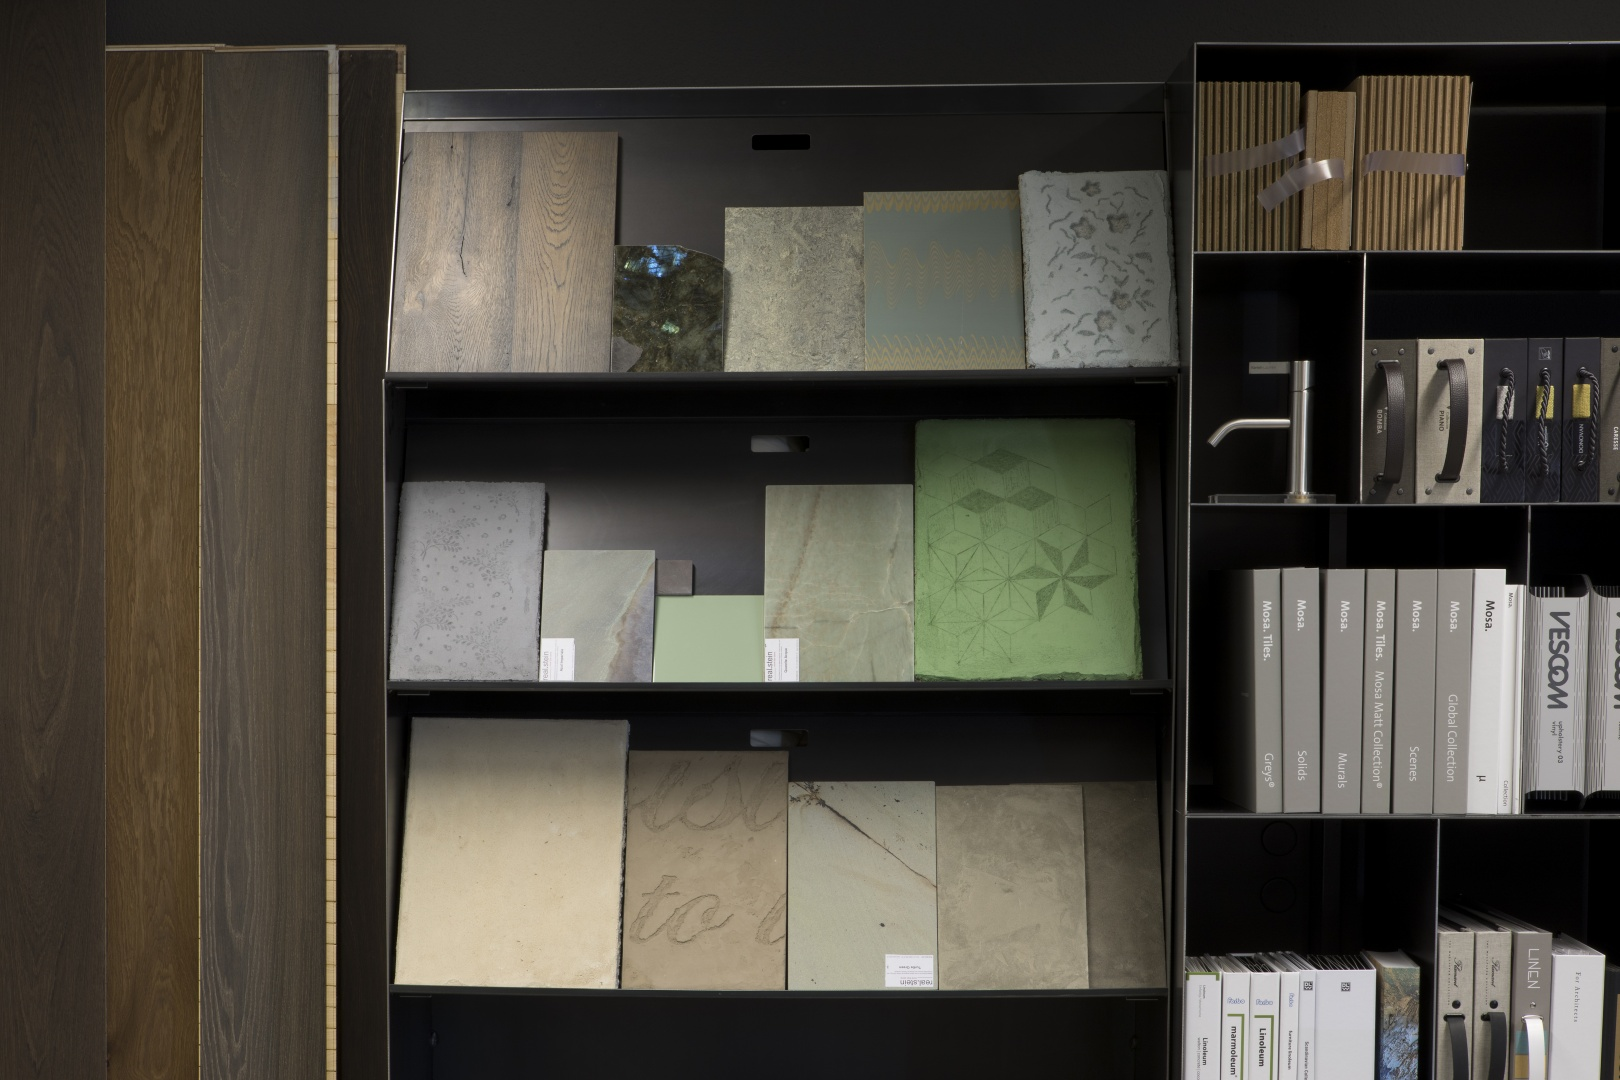 materialbibliothek_goodinteriors_1 © good interiors gmbh / Sibylle Meier